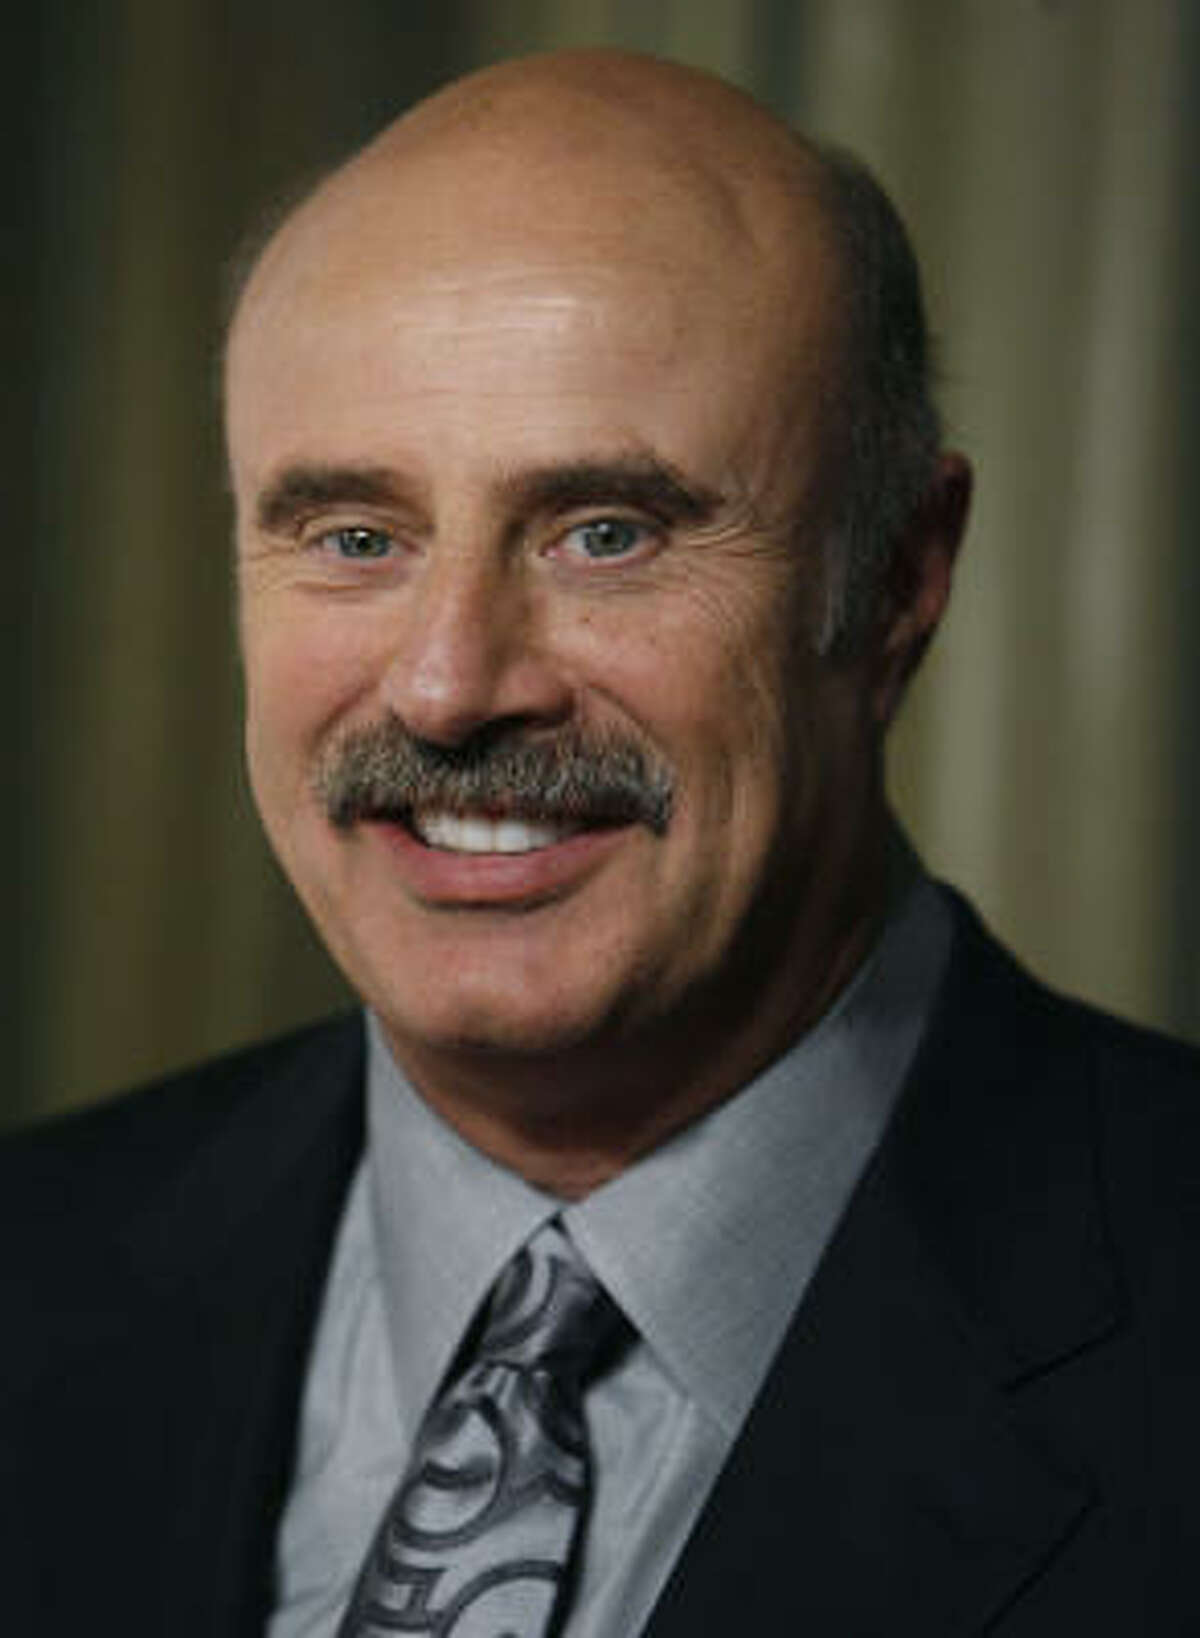 10. Dr. Phil McGraw $80 million